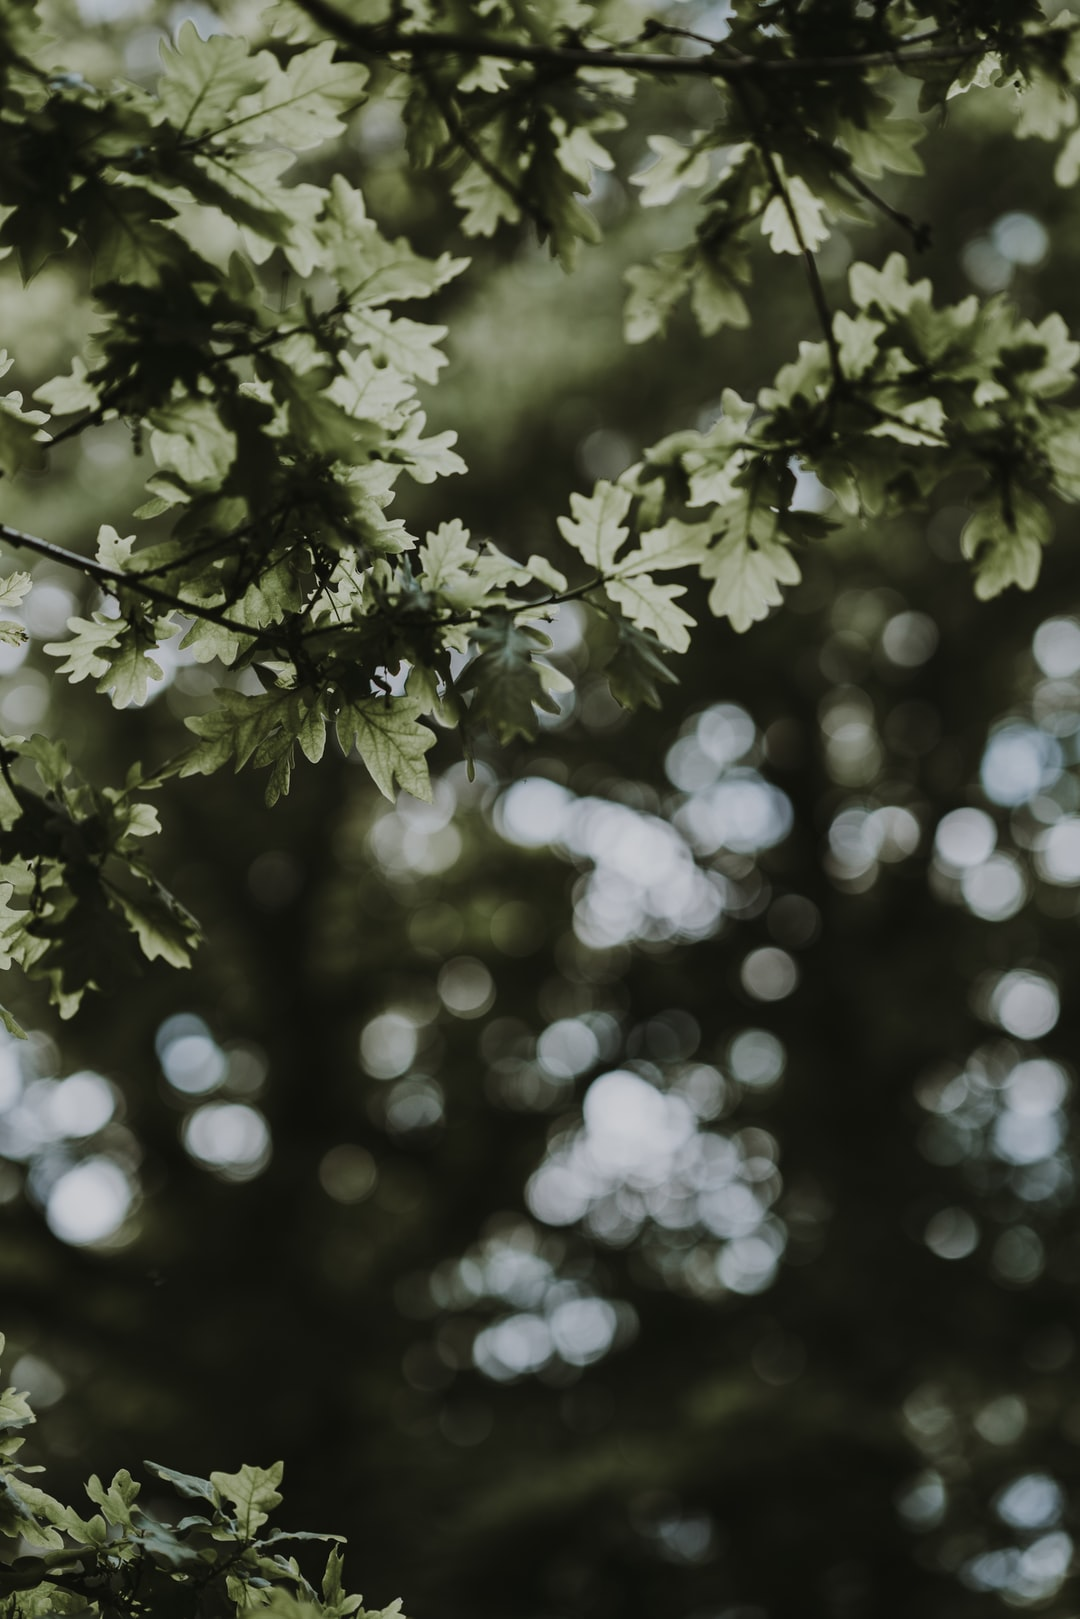 Light behind leaves creating bokeh effect